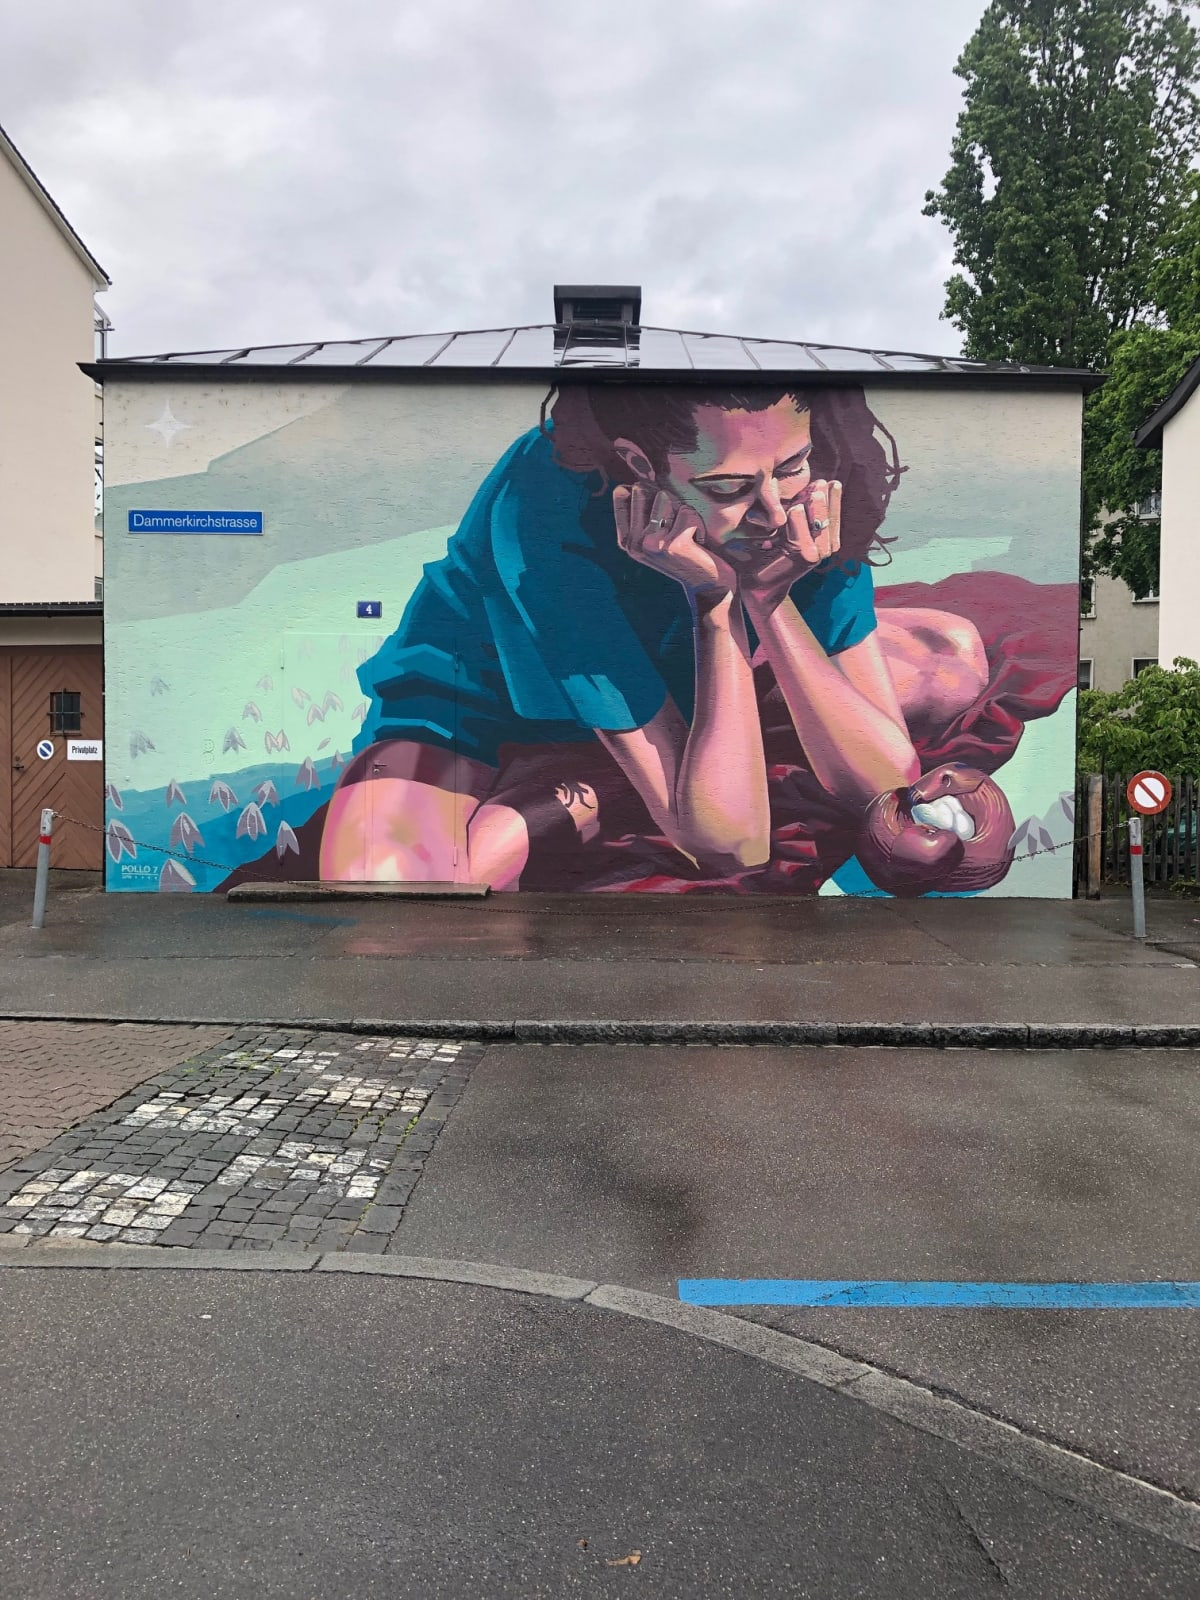 POLLO7   2019 Dammerkirchstrasse, BASEL AUFTRAGGEBER: IWB principal: iwb